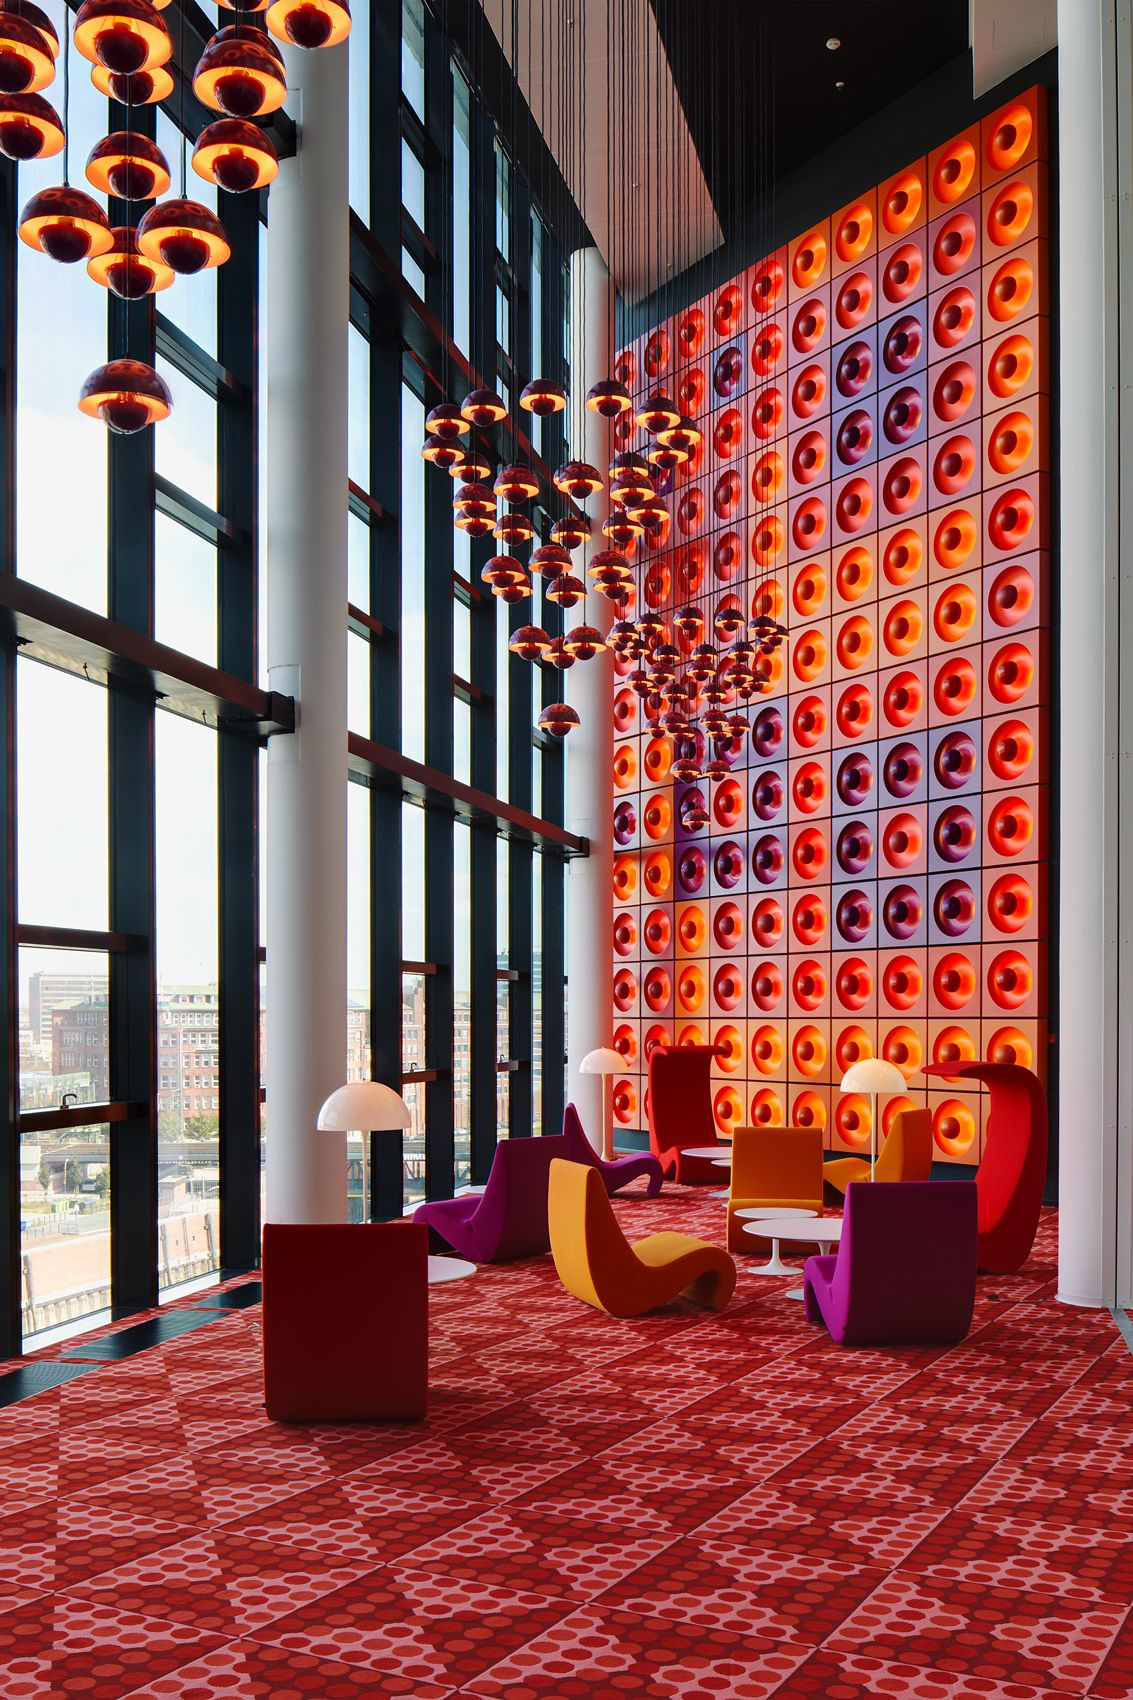 Verner panton interior design - Explore Workspace Design Office Interior Design And More Spiegel Publishing House Hamburg Vernerpanton